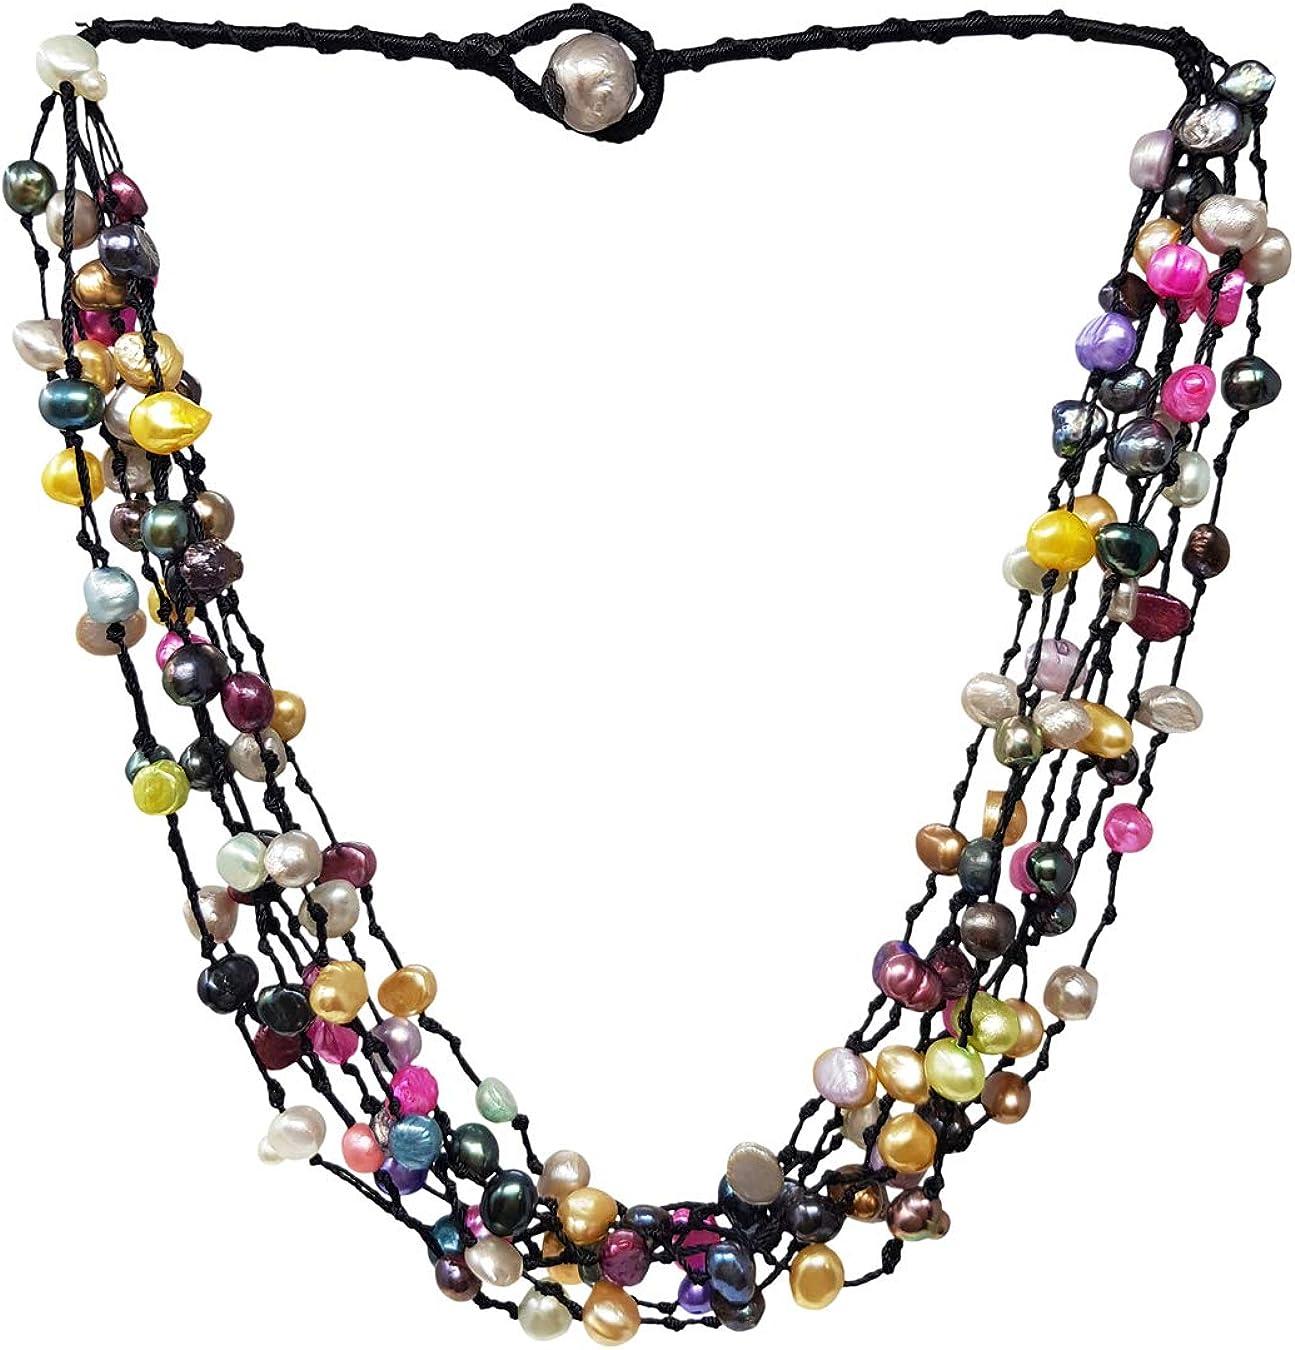 TreasureBay Stunning Multi-Strand Natural Freshwater Pearl Necklace, Women's Pearl Necklace (Multicolored)